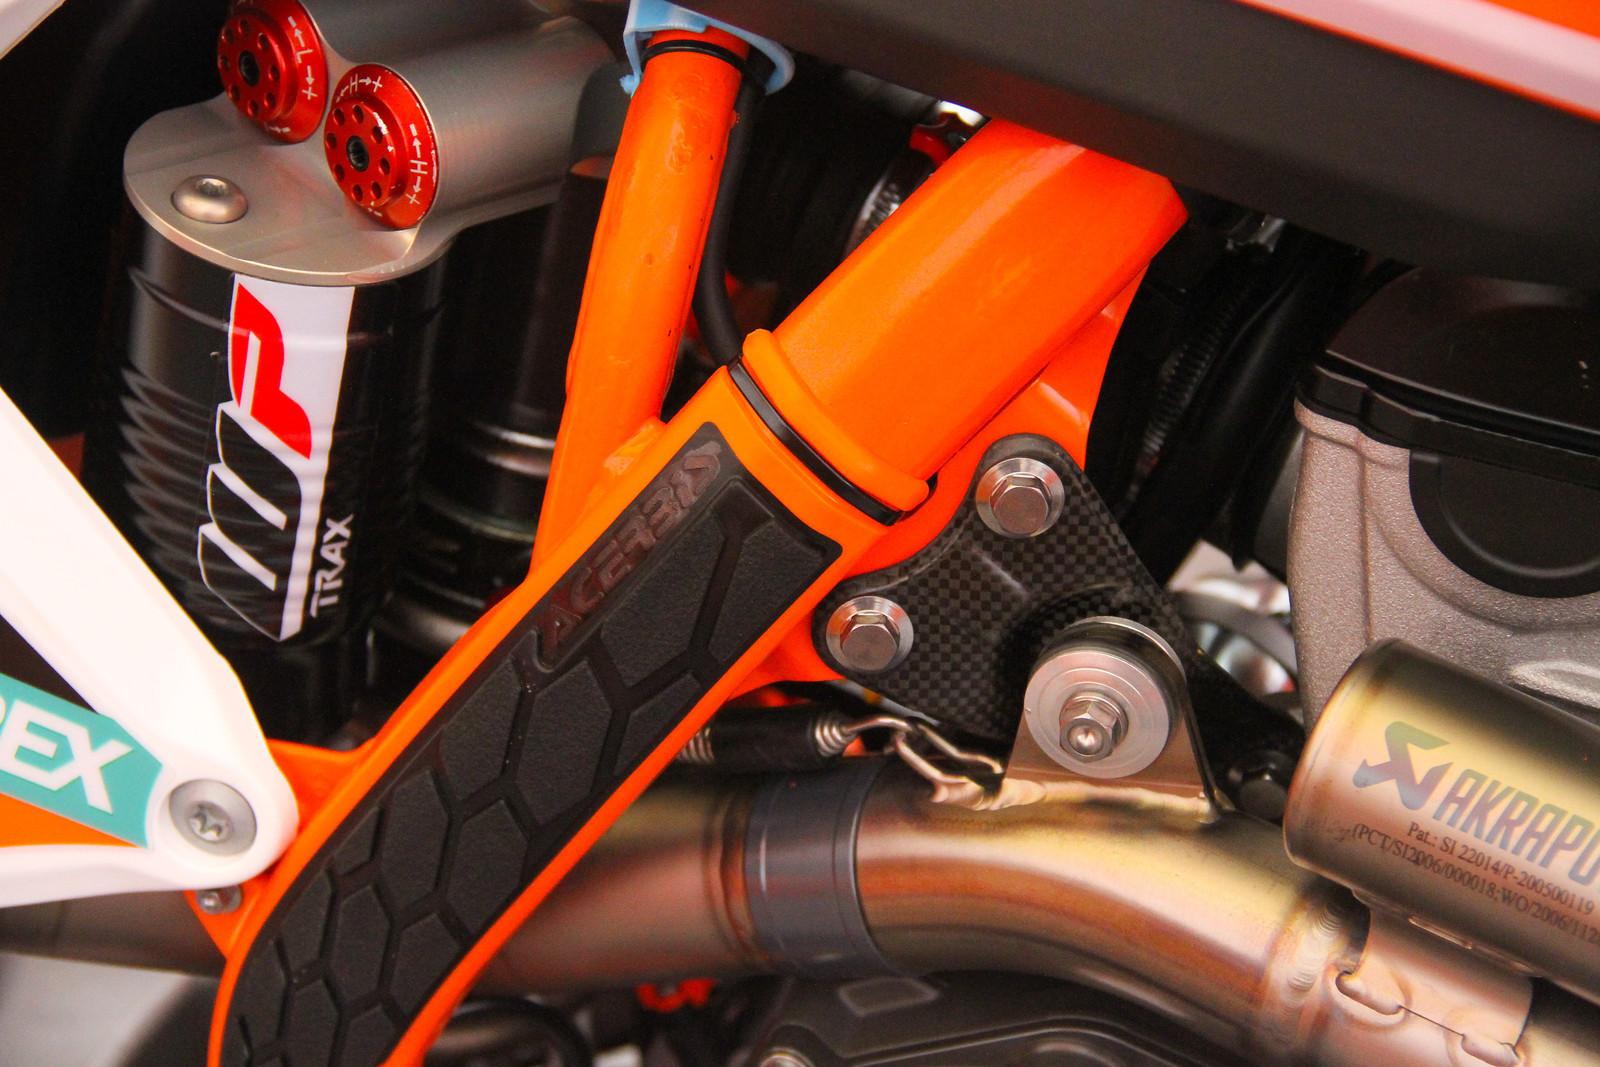 Pauls Jonass' Bike Carbon Fibre - ayearinmx - Motocross Pictures - Vital MX